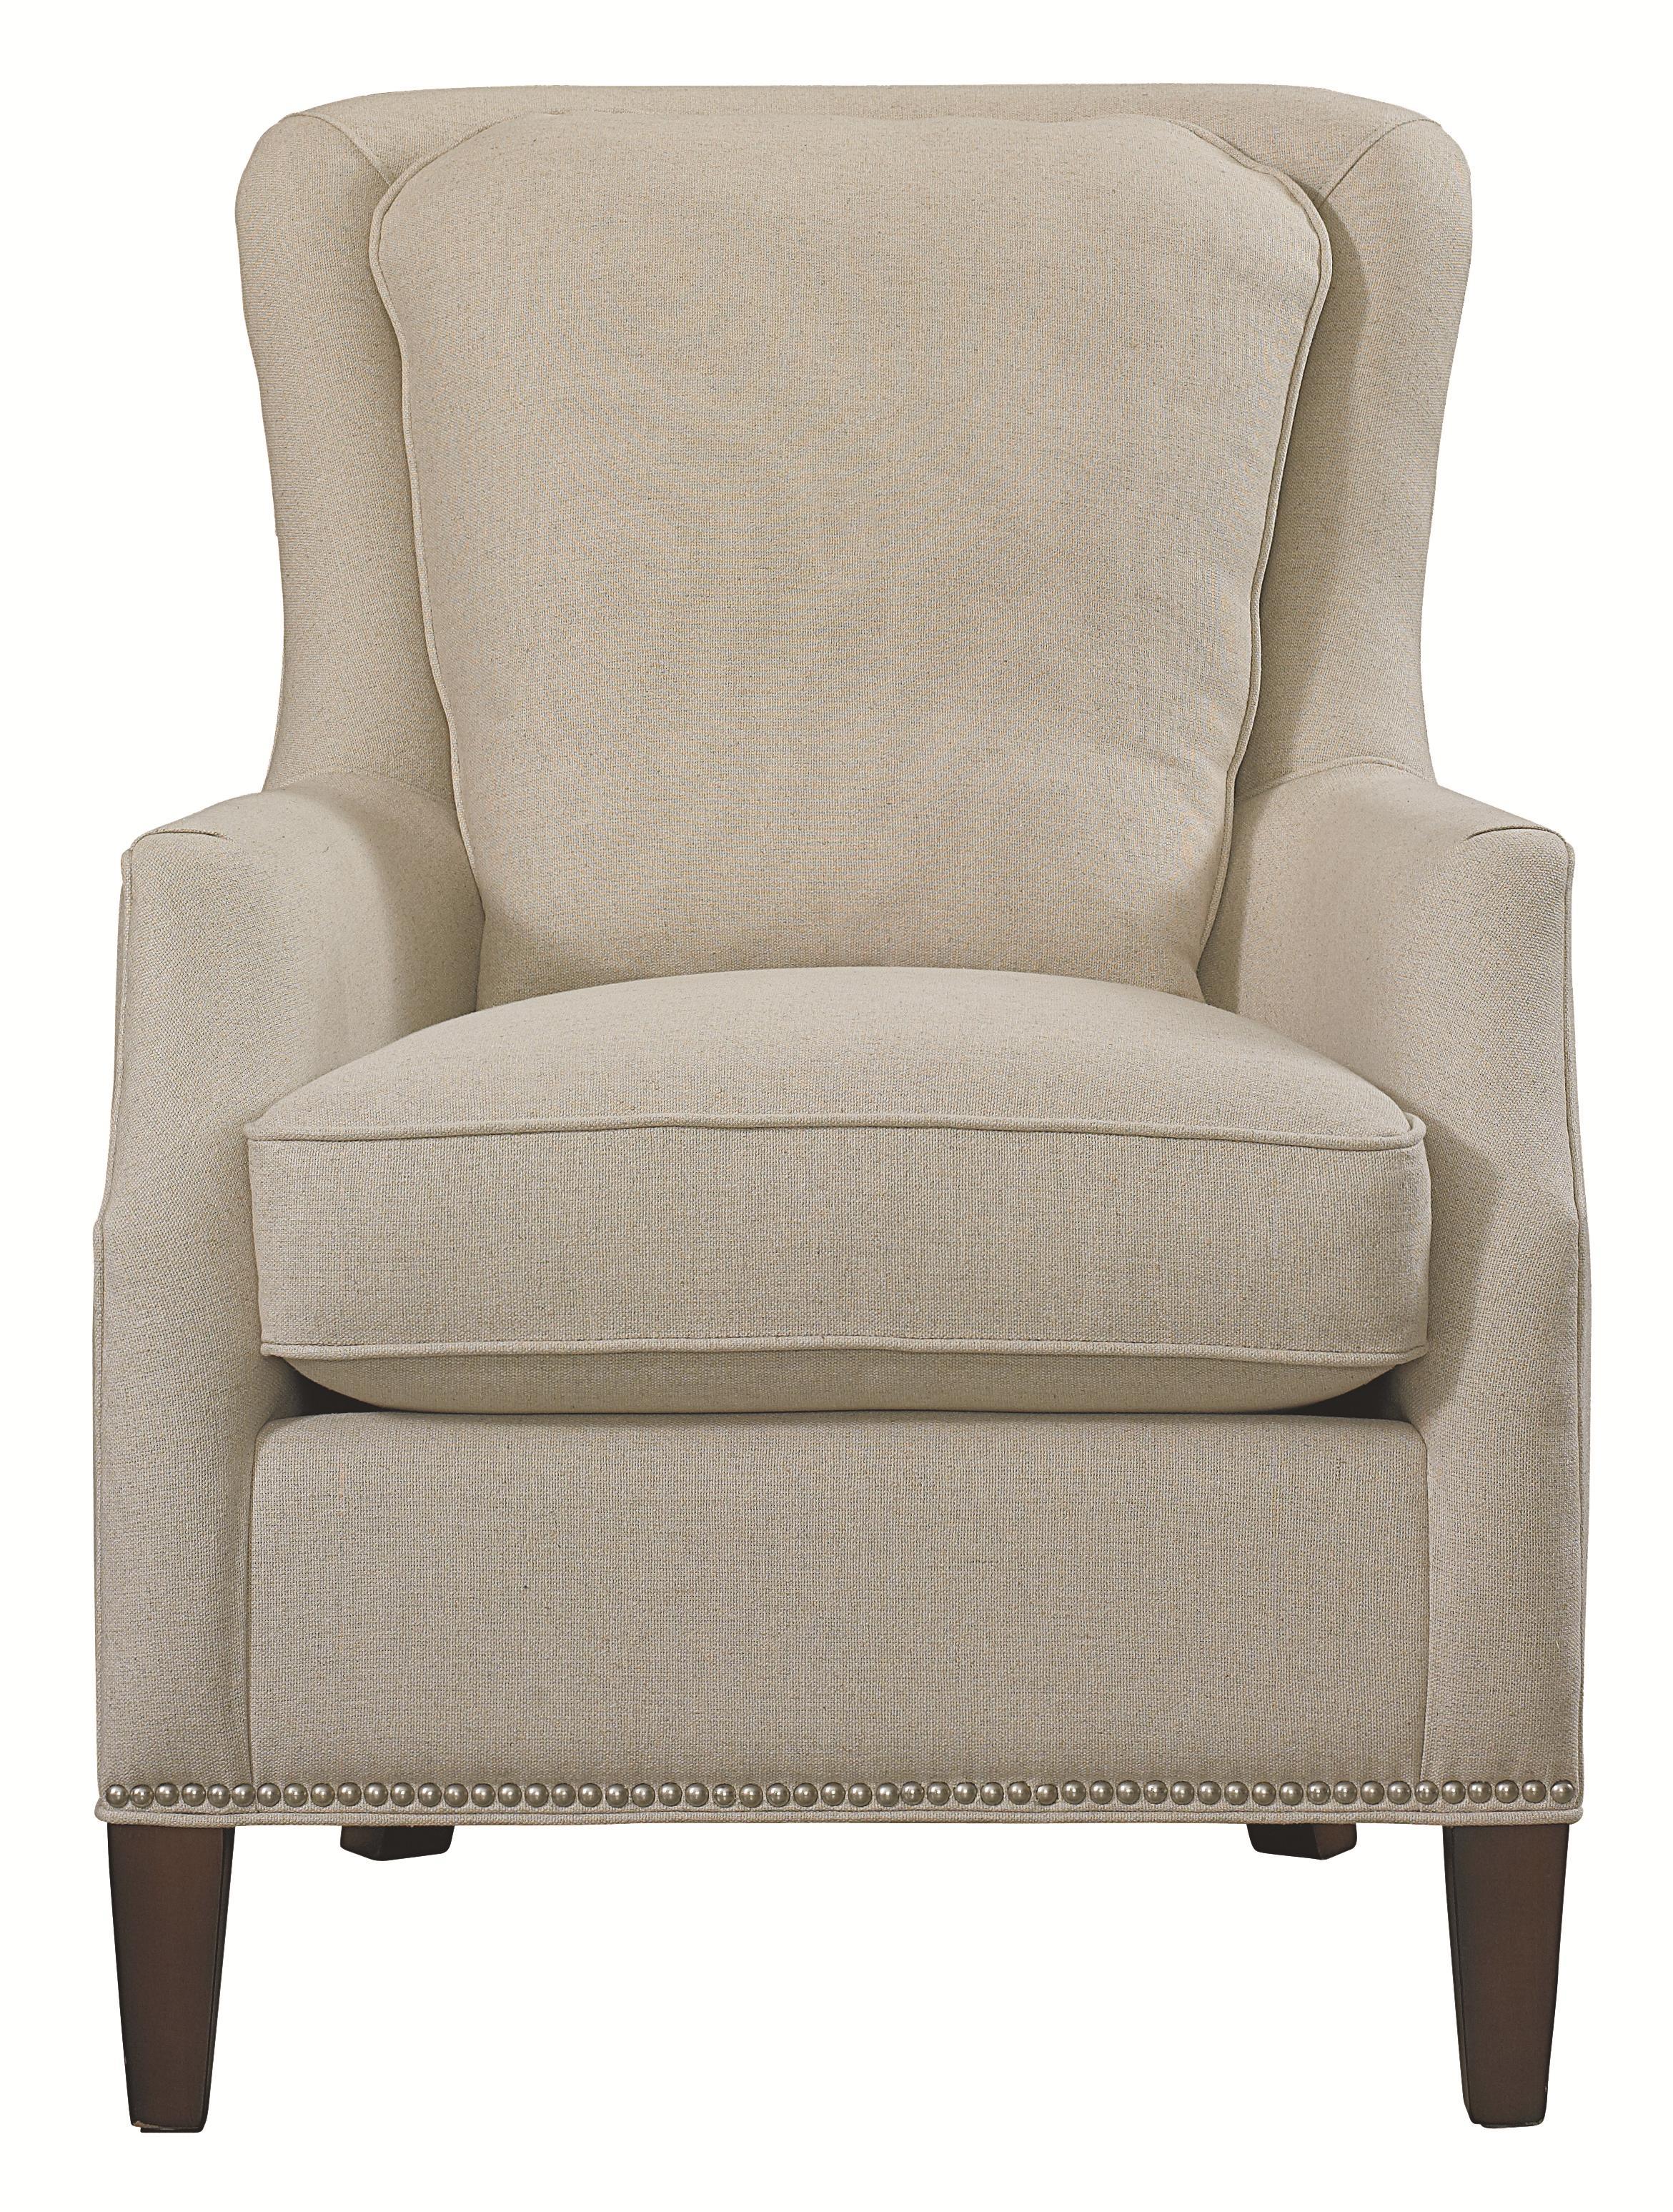 Ordinaire Bassett Accent Chairs By BassettKent Accent Chair ...